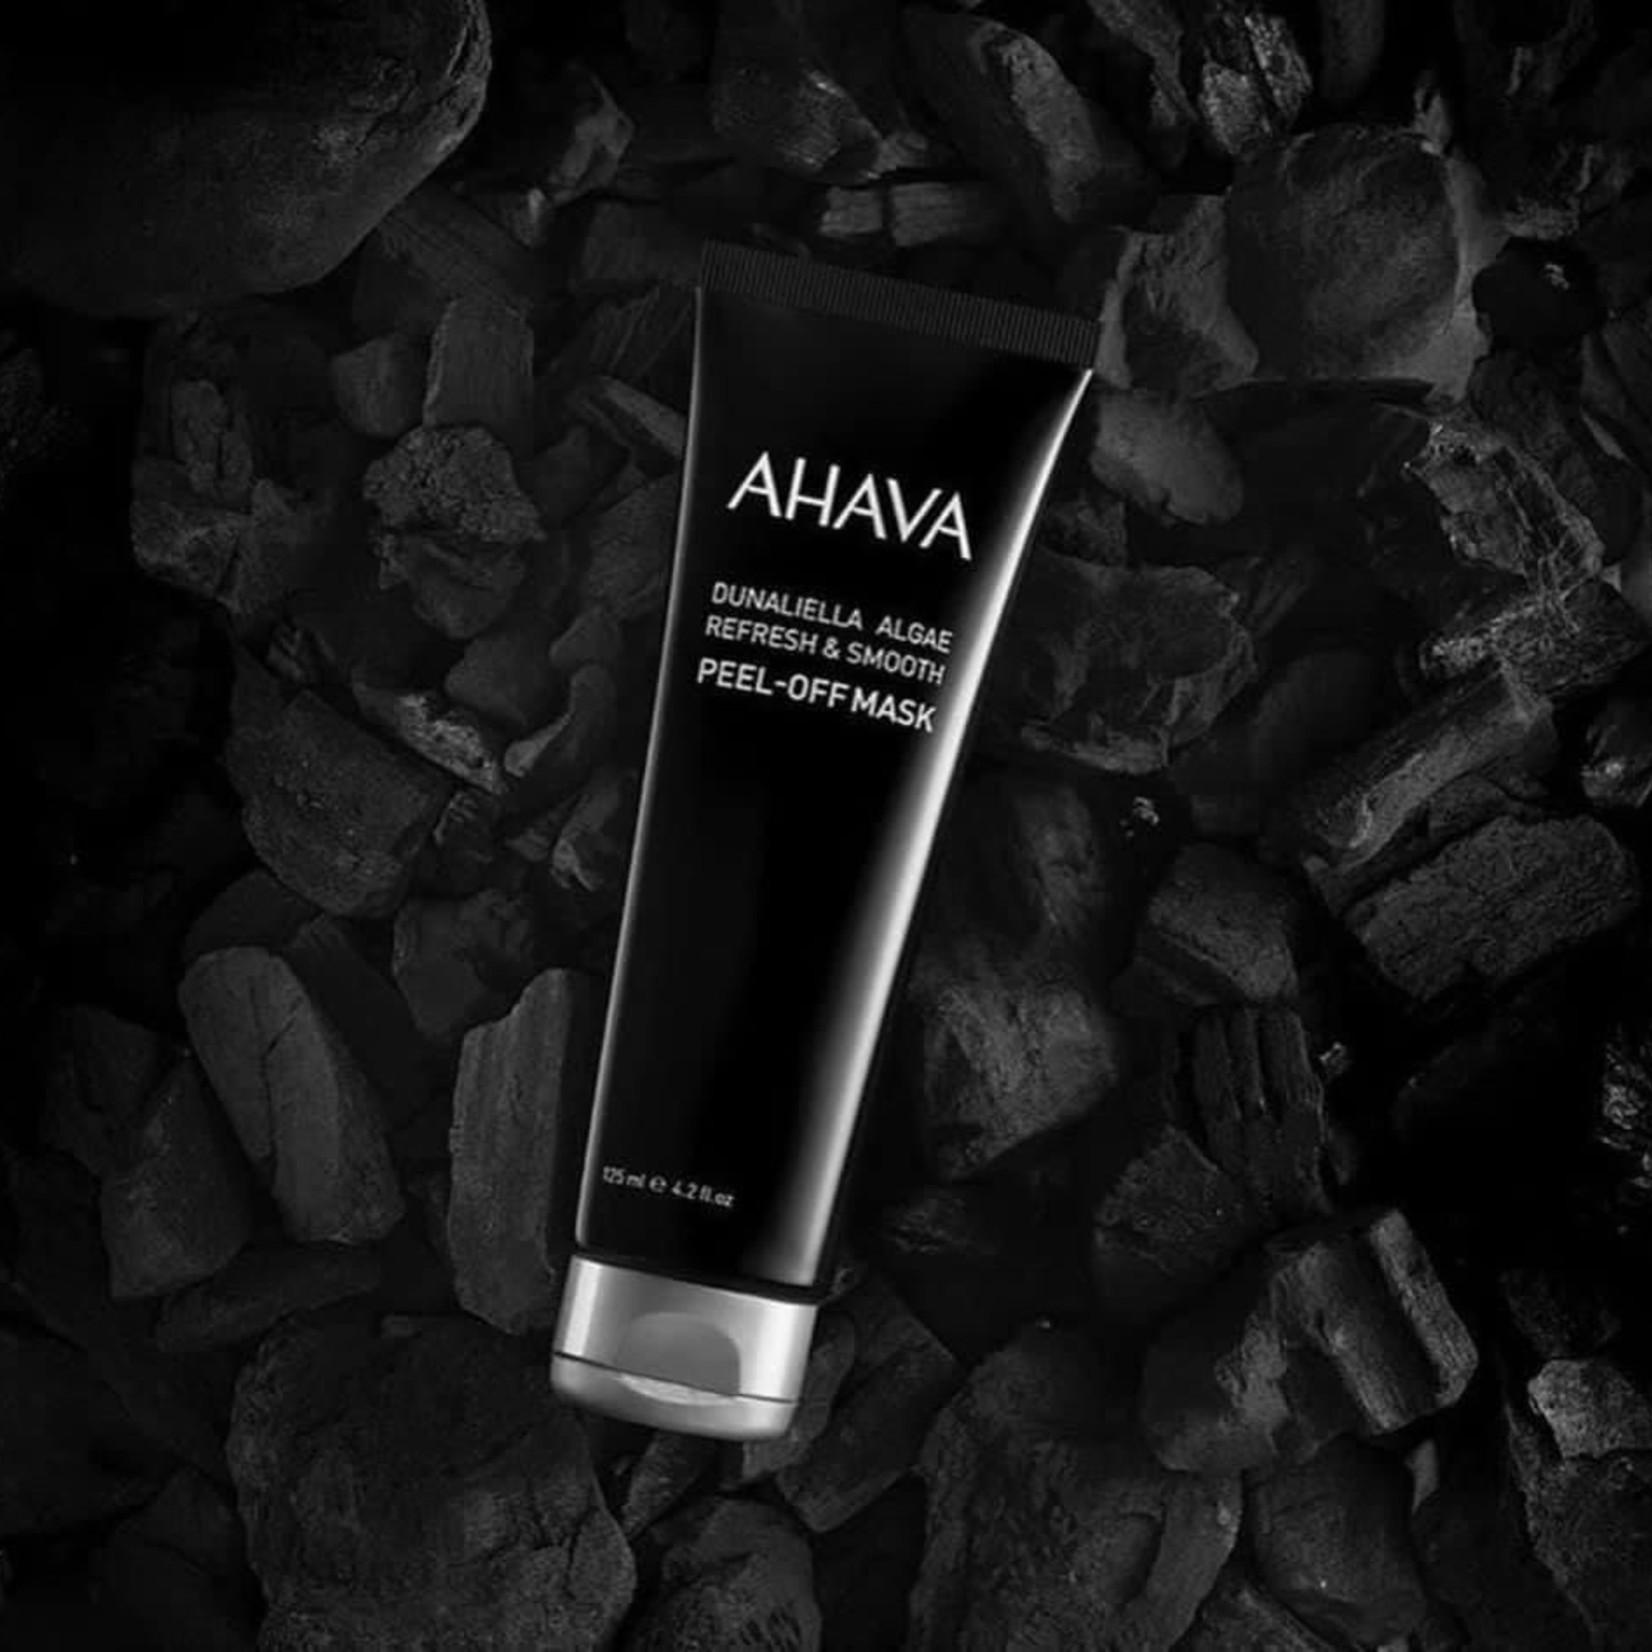 AHAVA Dunaliella algae refresh & smooth peel off mask